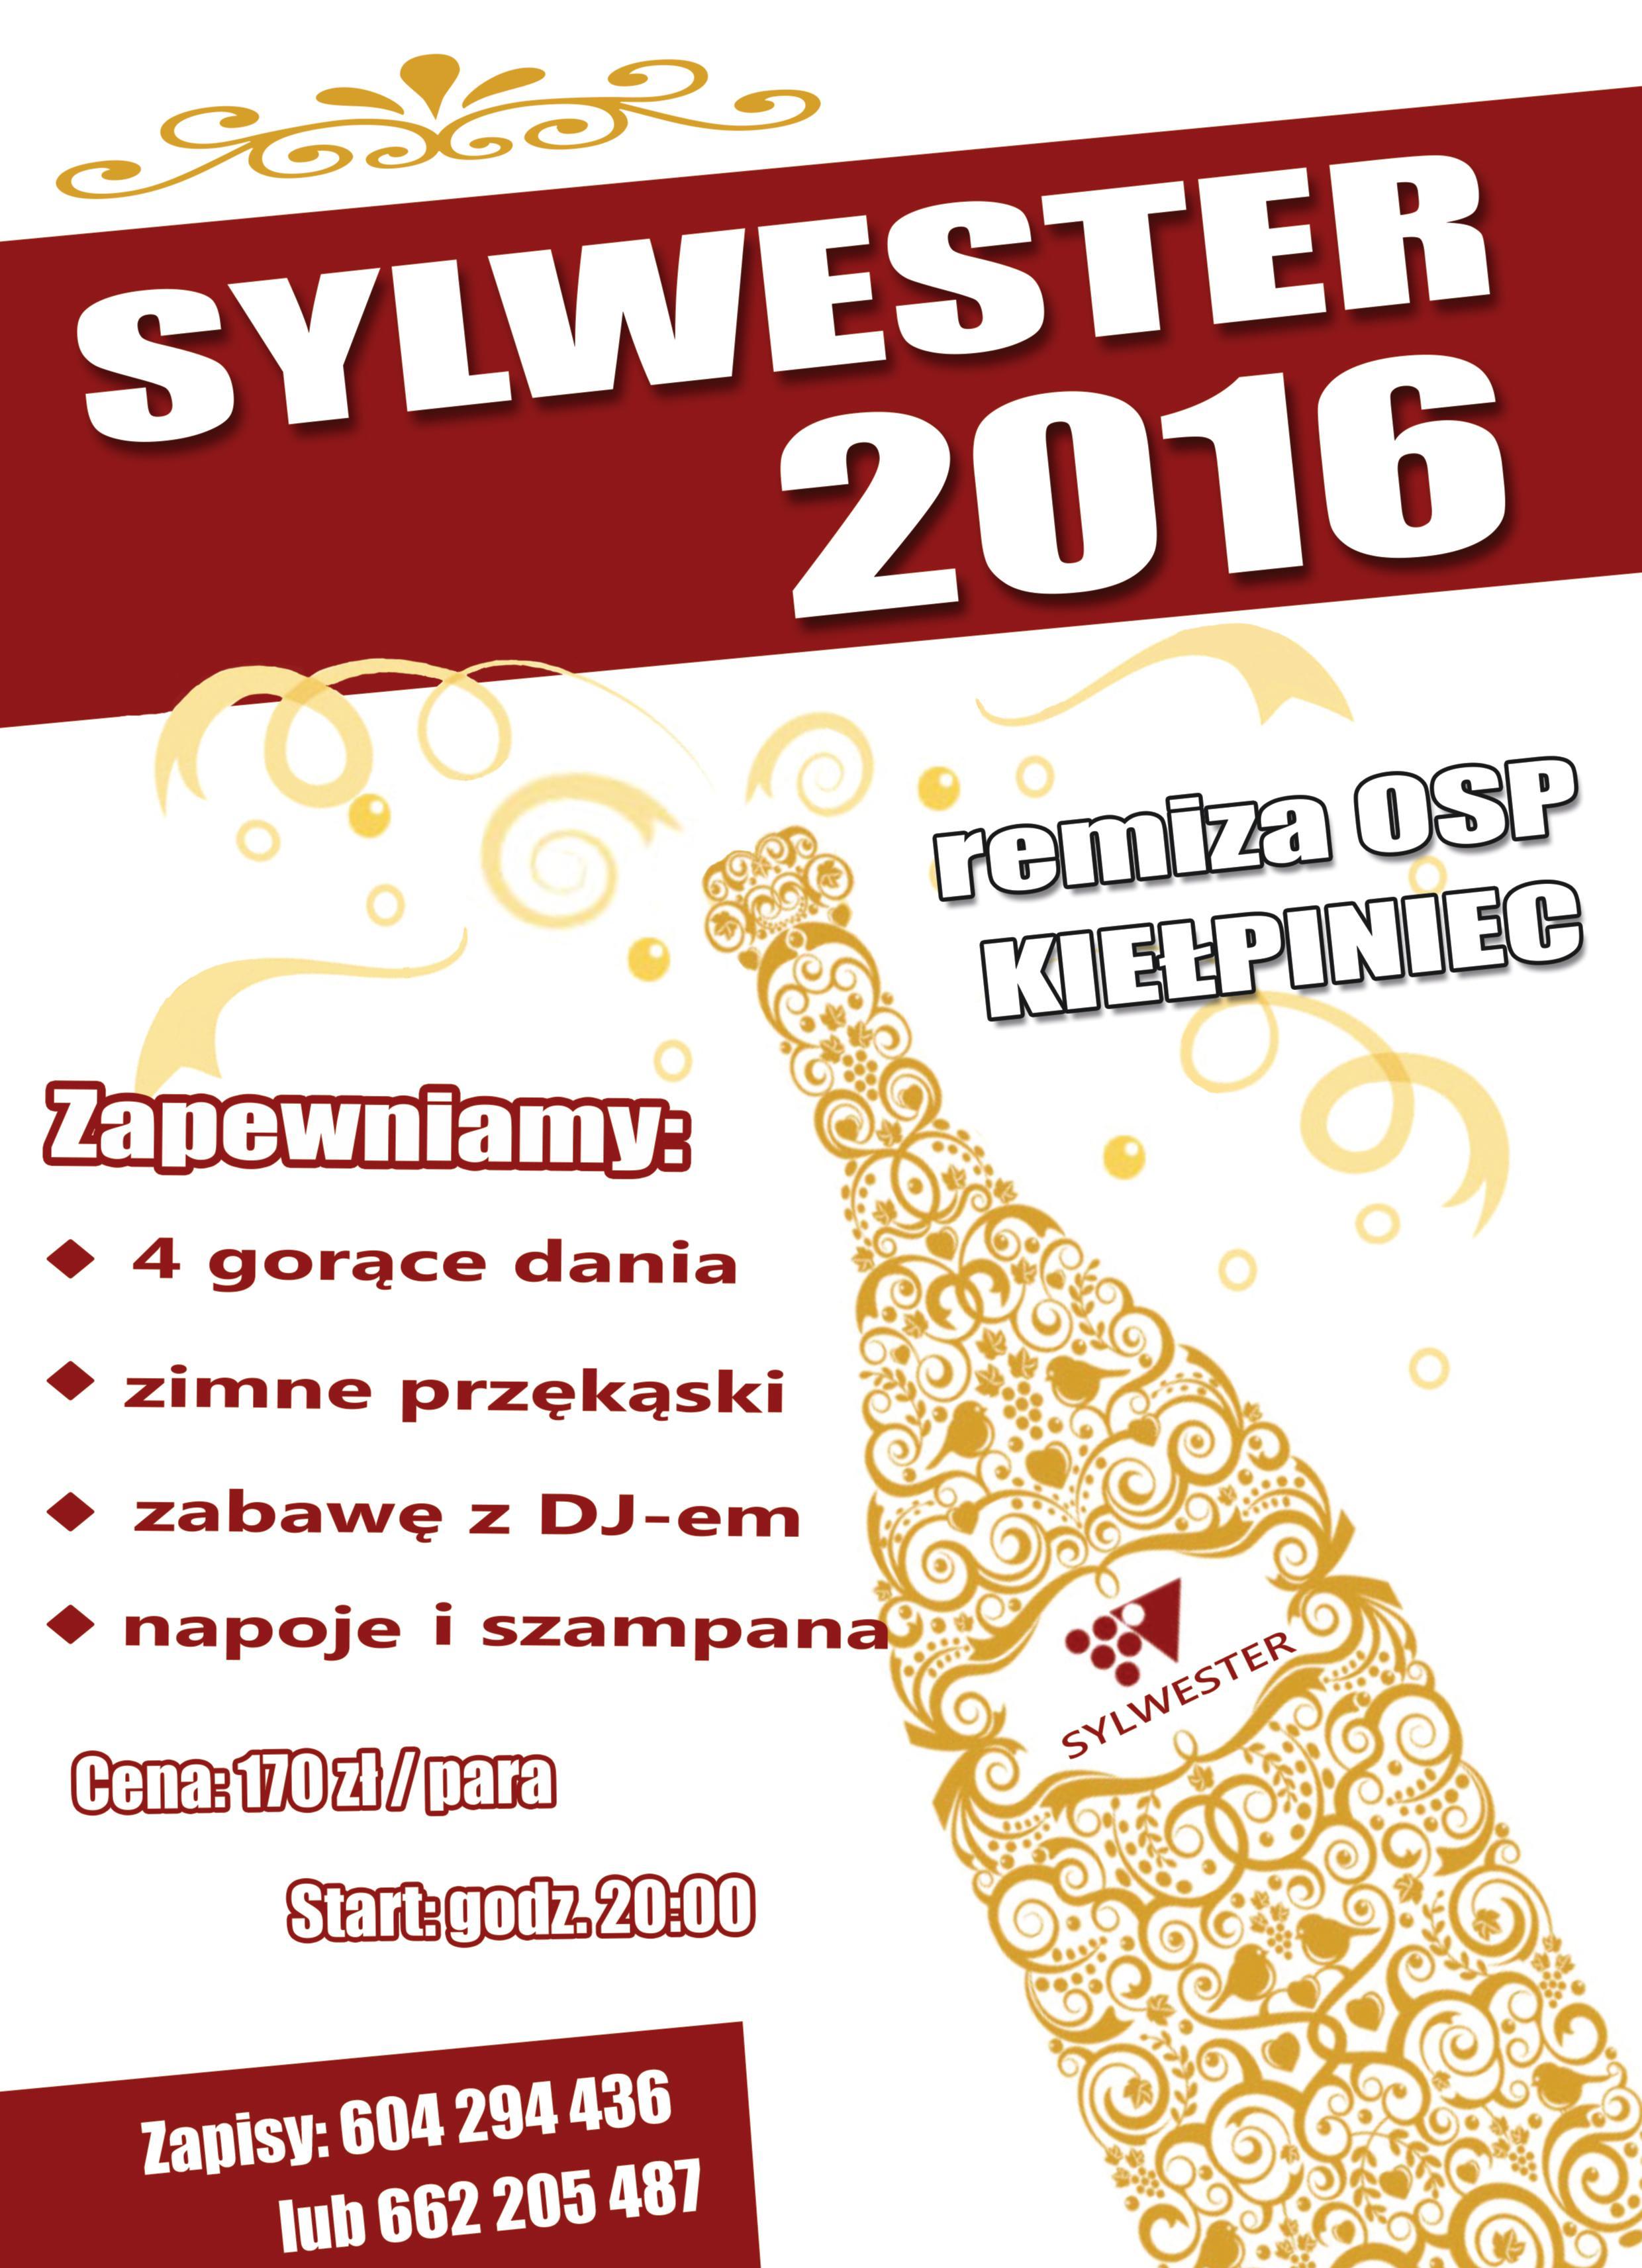 kiełpiniec sylwester 2016